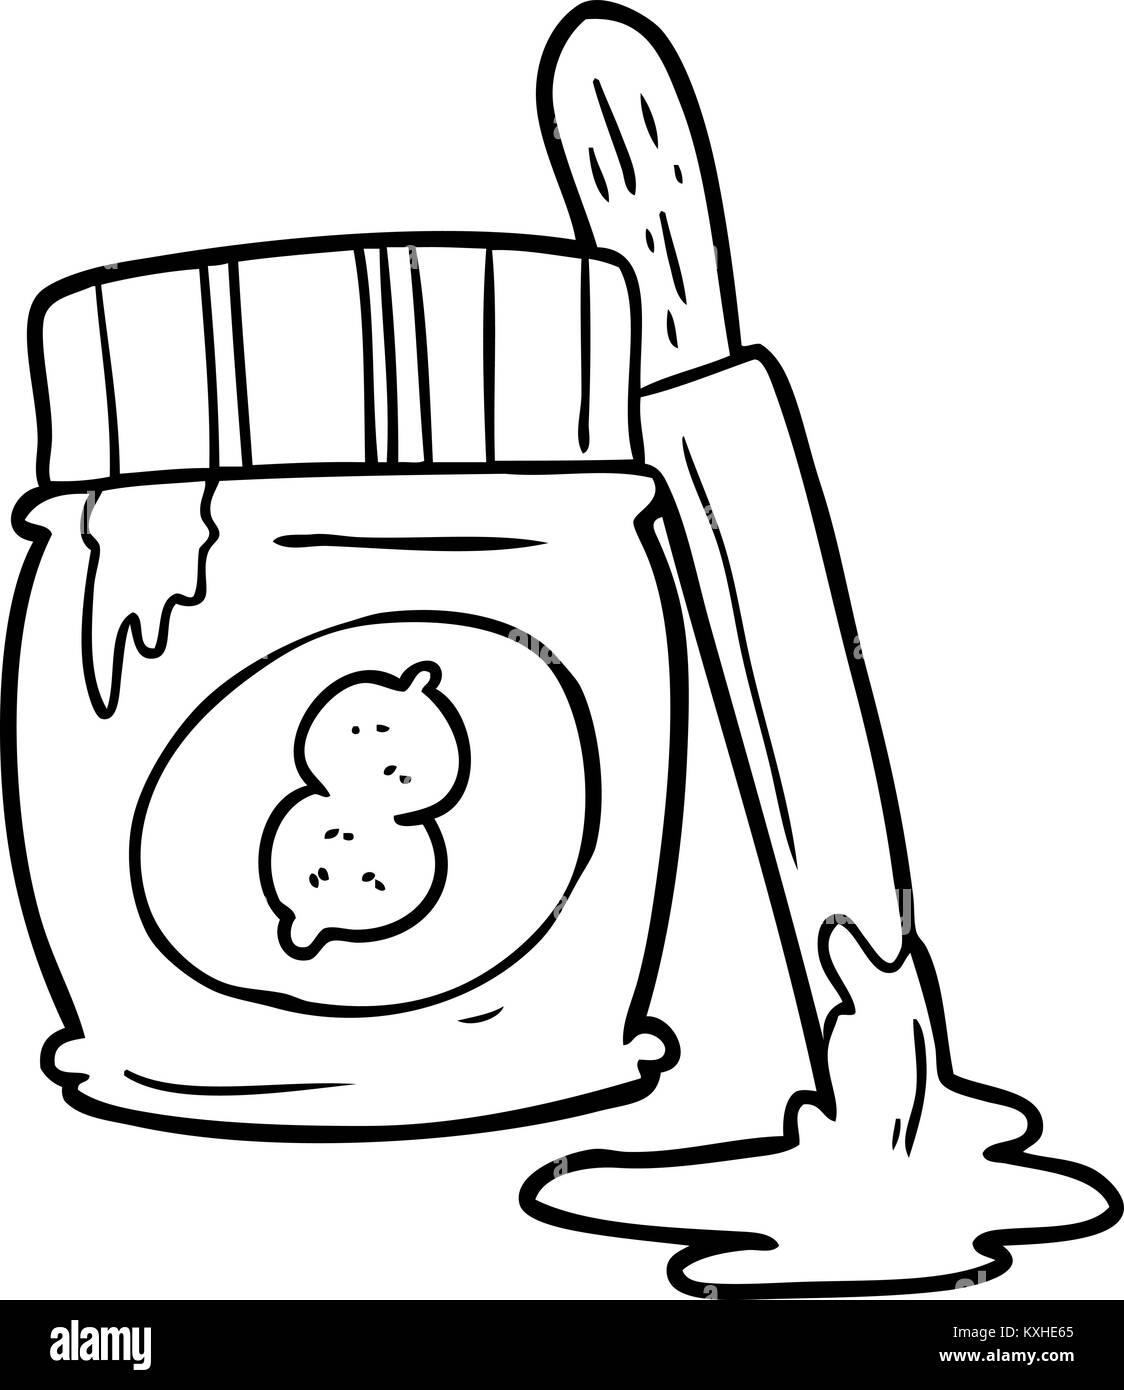 Peanut Drawing